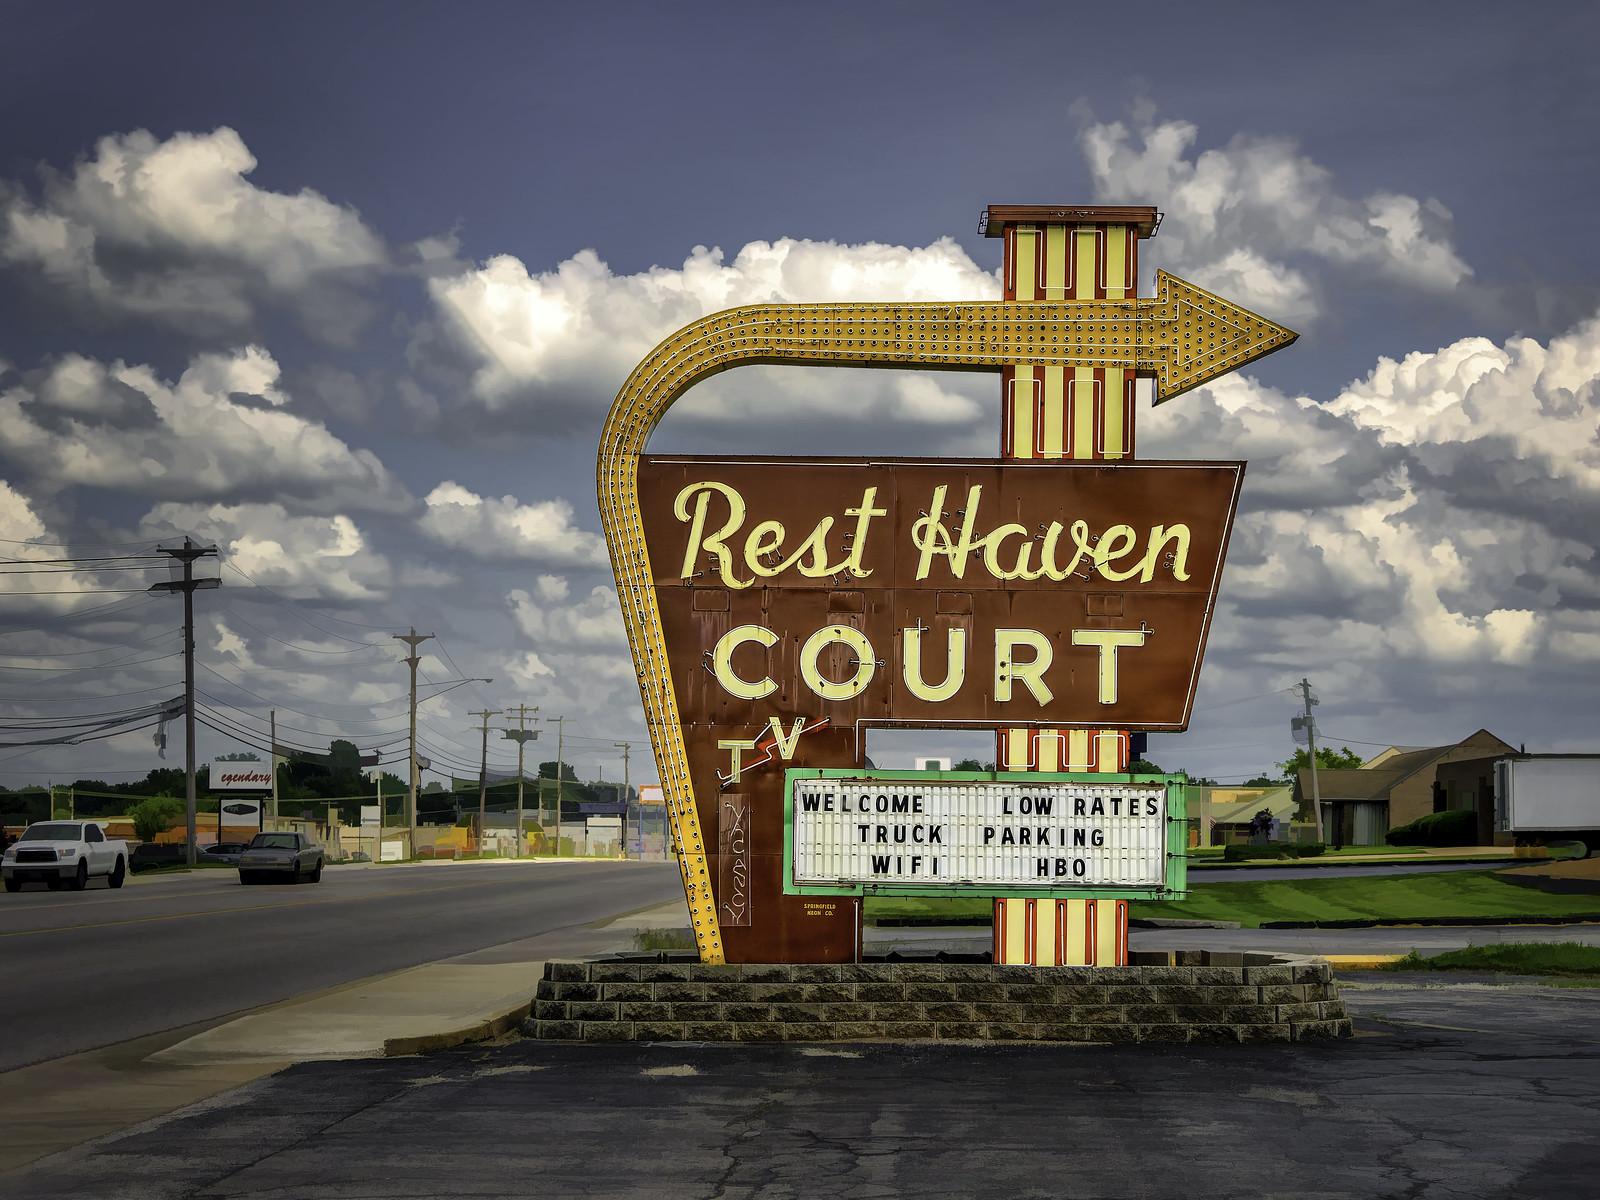 Rest Haven Court - 2000 East Kearney Street, Springfield, Missouri U.S.A. - May 22, 2018